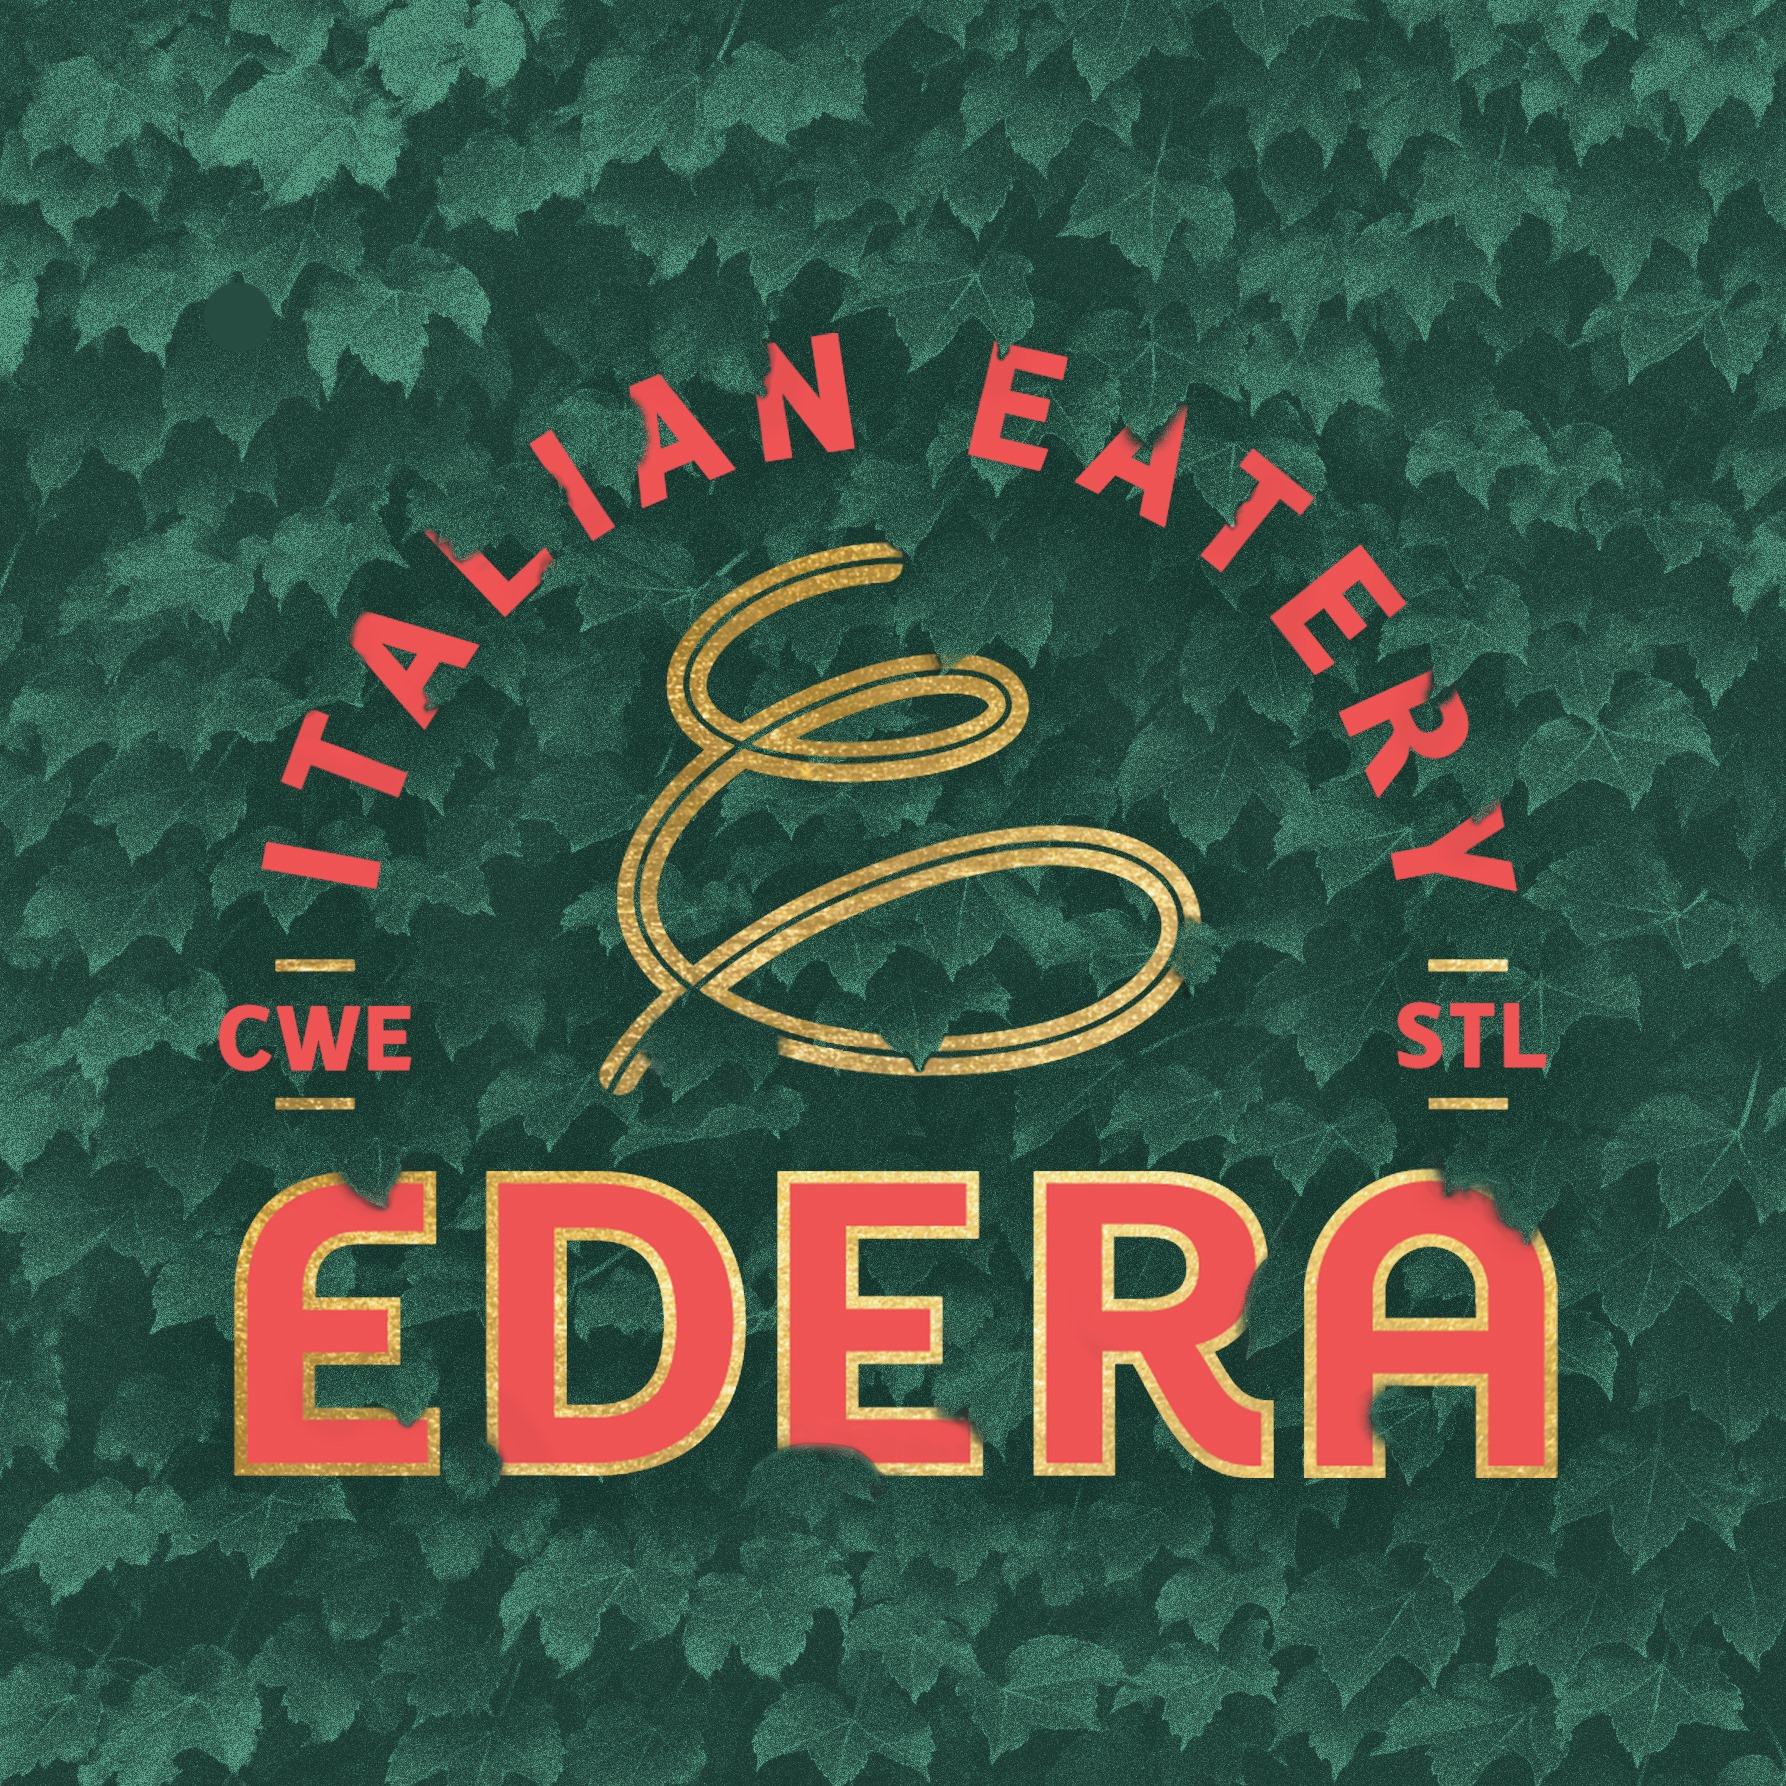 Edera Italian Eater Logo on ivy backdrop